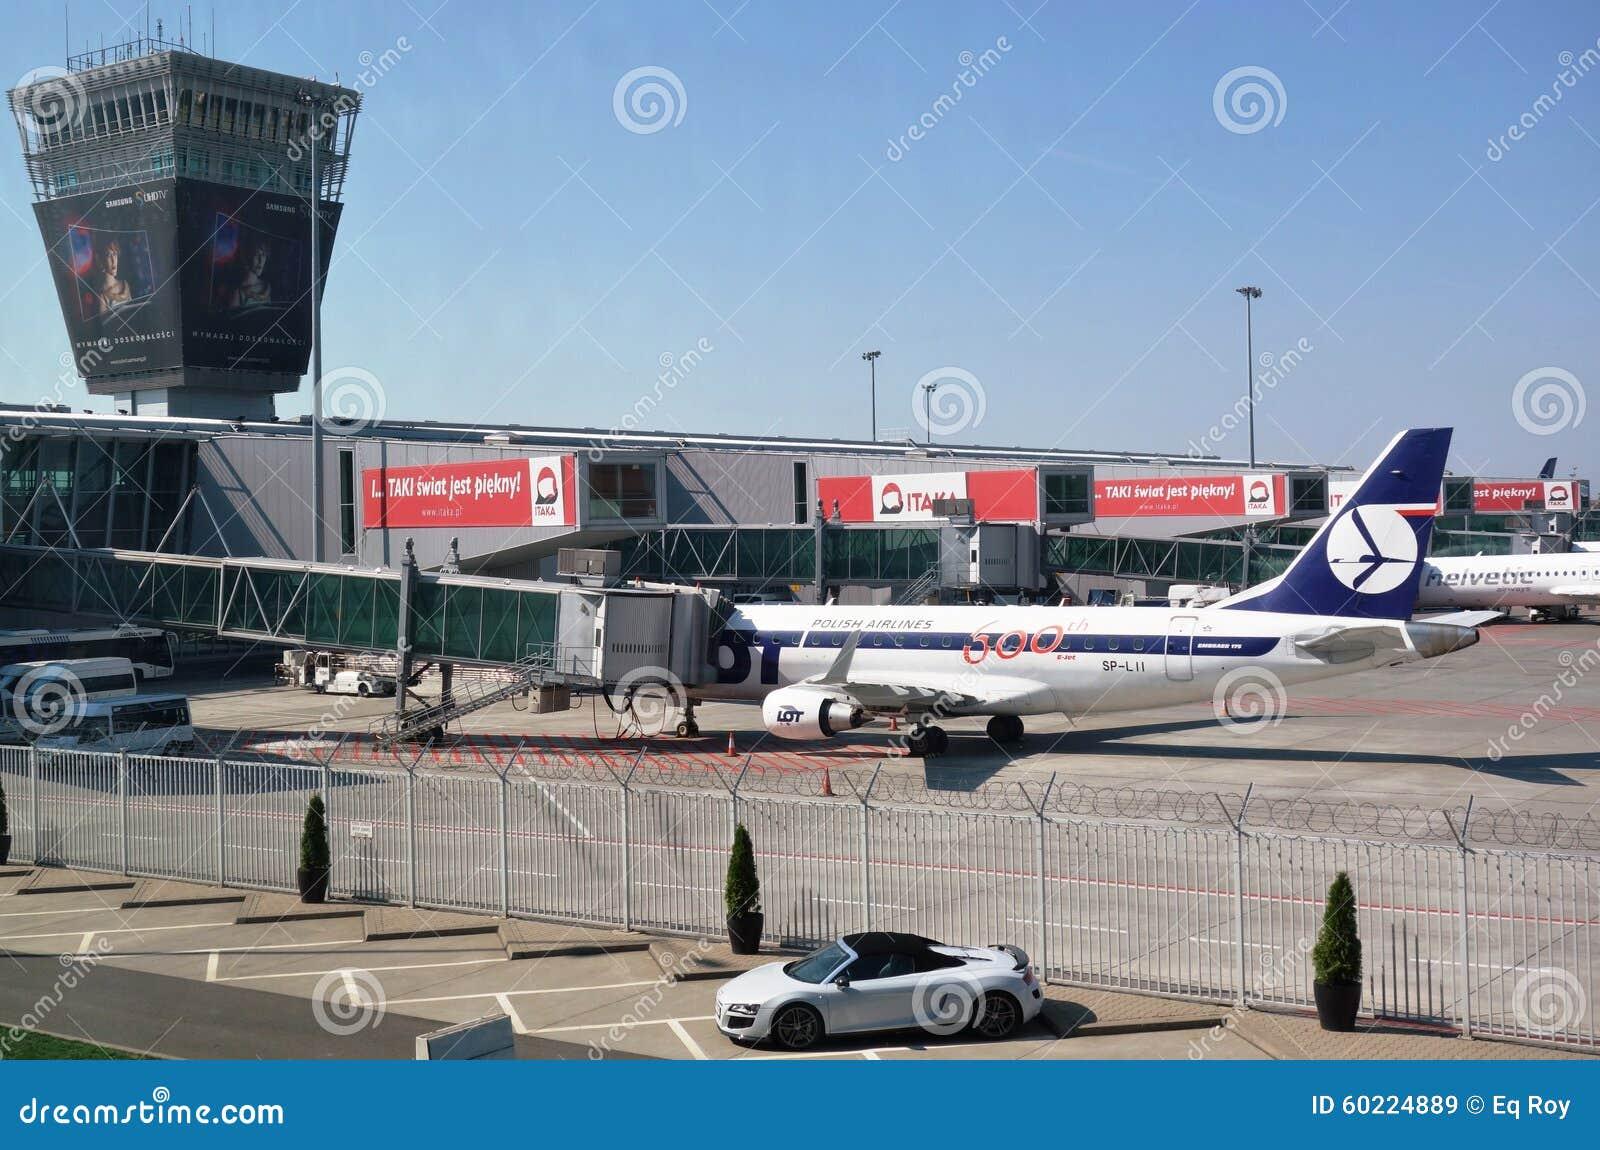 Aeroporto Waw : The warsaw chopin airport waw editorial stock image image of